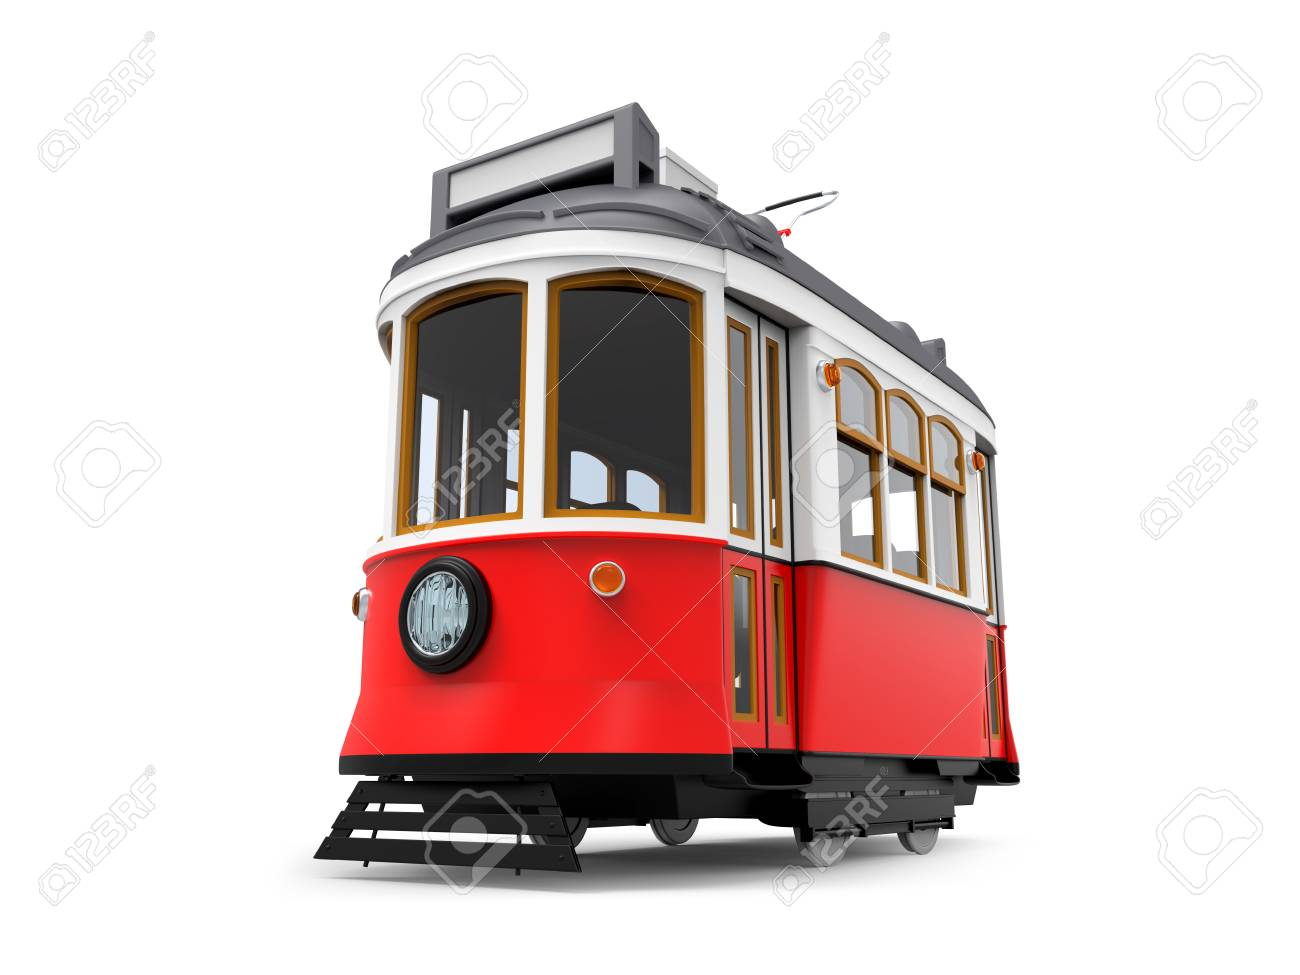 old tram cartoon - 115682309